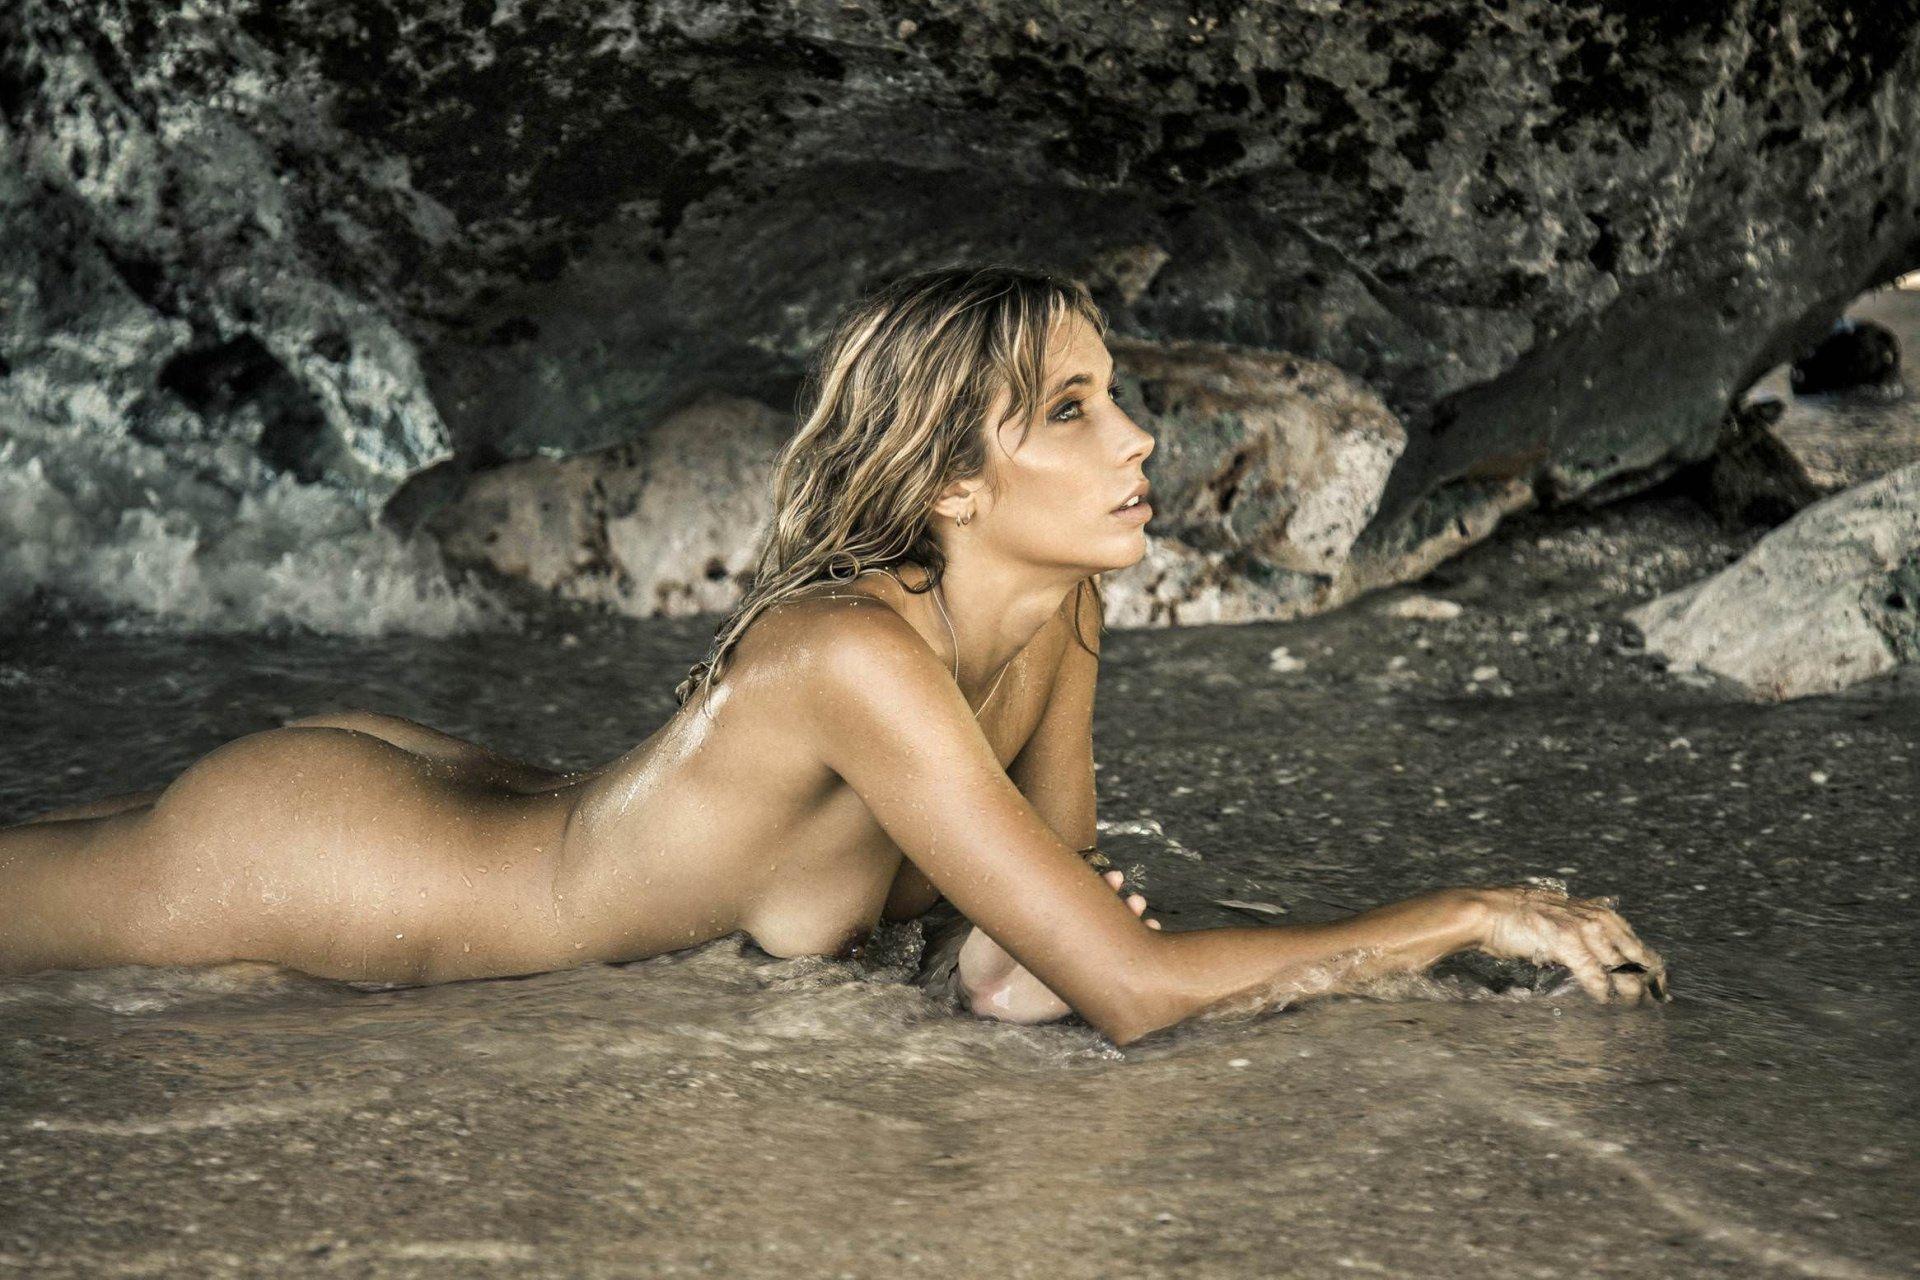 Isabelle fuhrman fappening,Kate england victoria banx sexy 47 Photos XXX archive Lauren Goodger See Through -,WTF Anushka Sharma